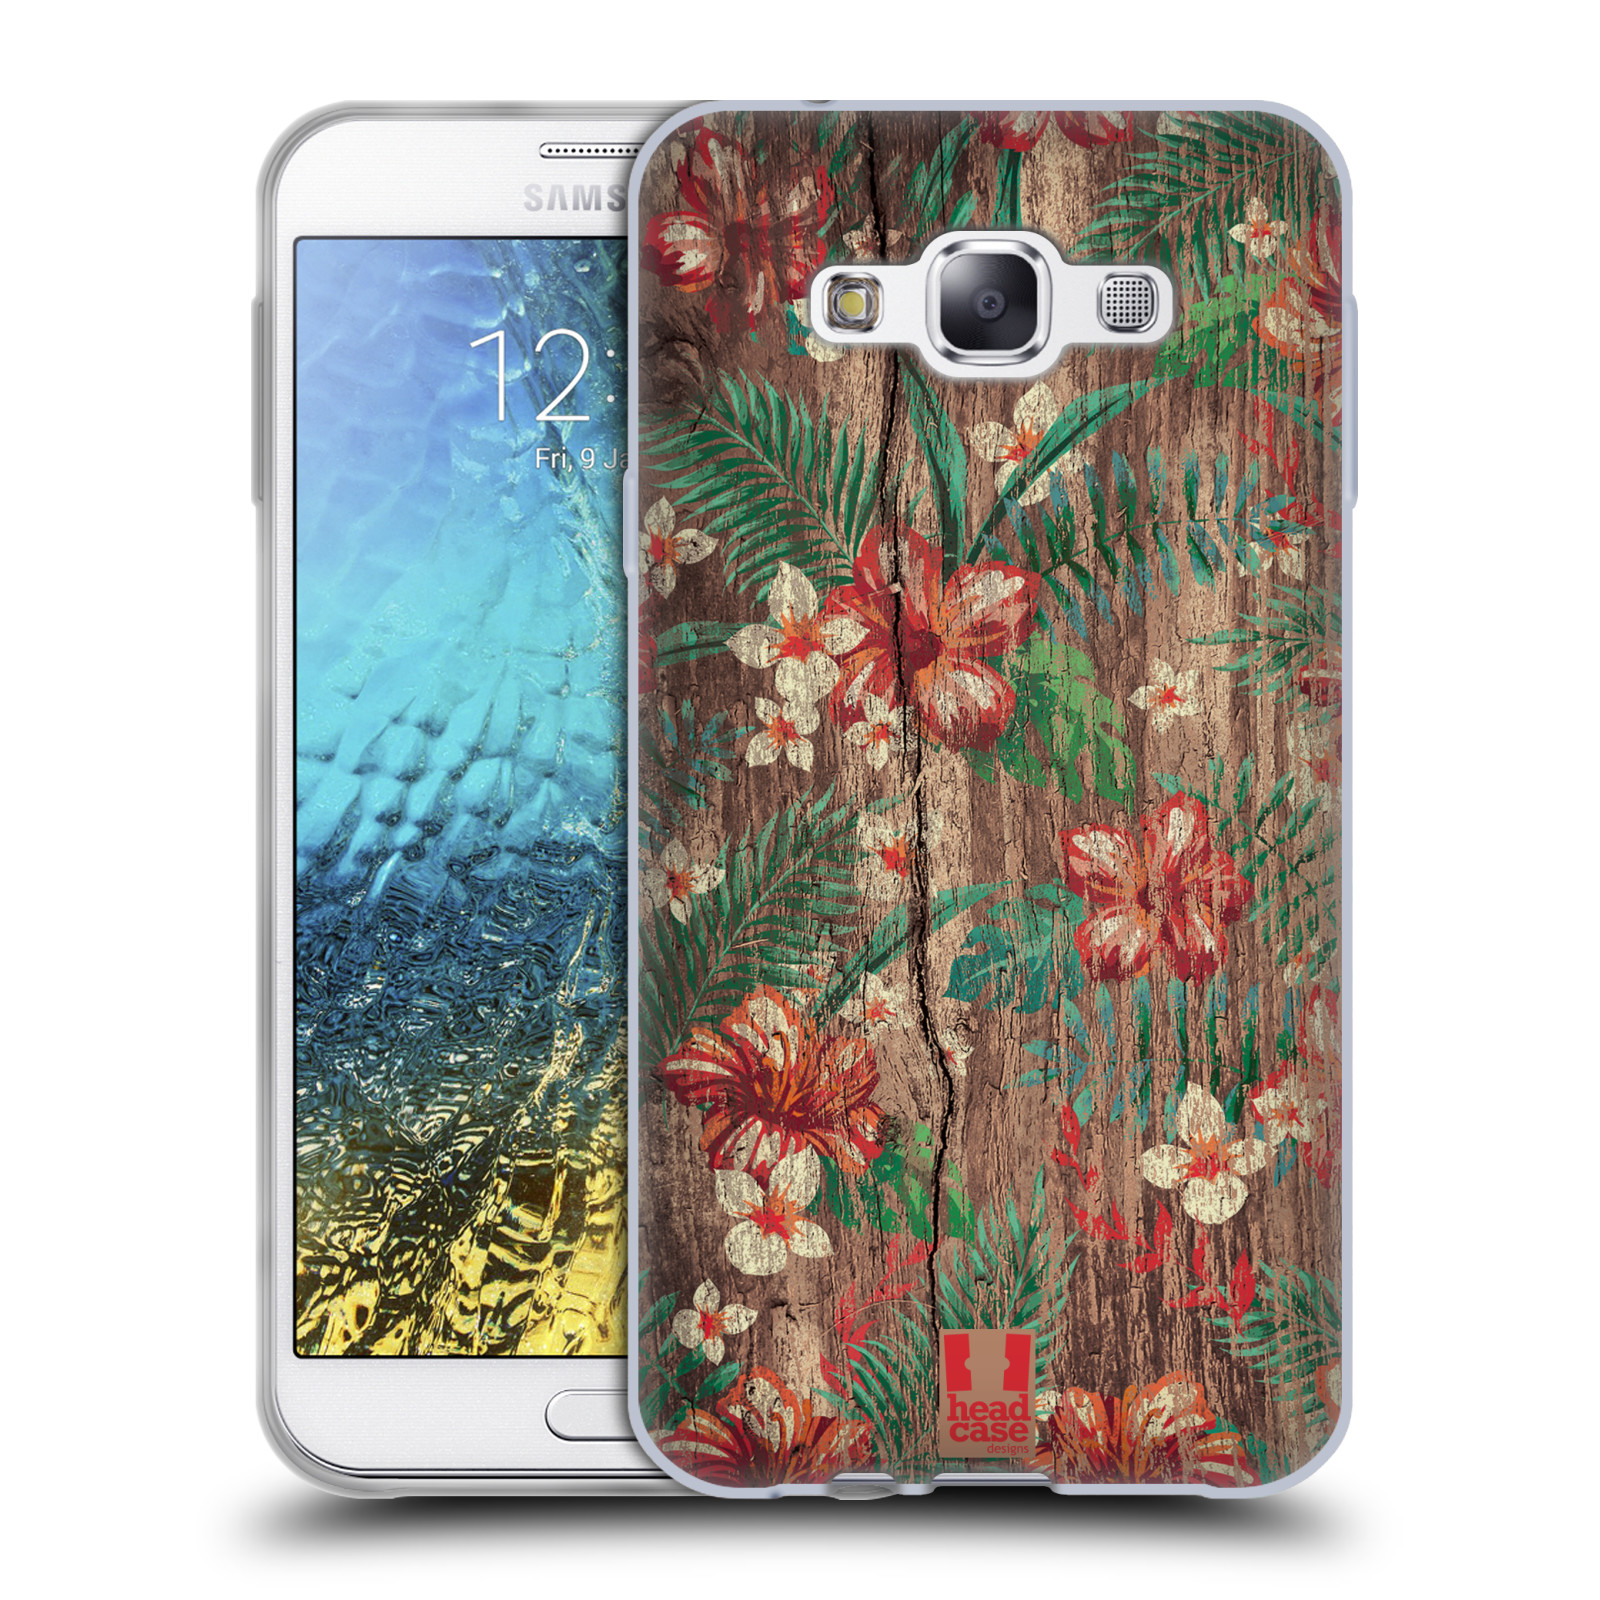 HEAD-CASE-DESIGNS-FLORAL-RUINS-SOFT-GEL-CASE-FOR-SAMSUNG-PHONES-3